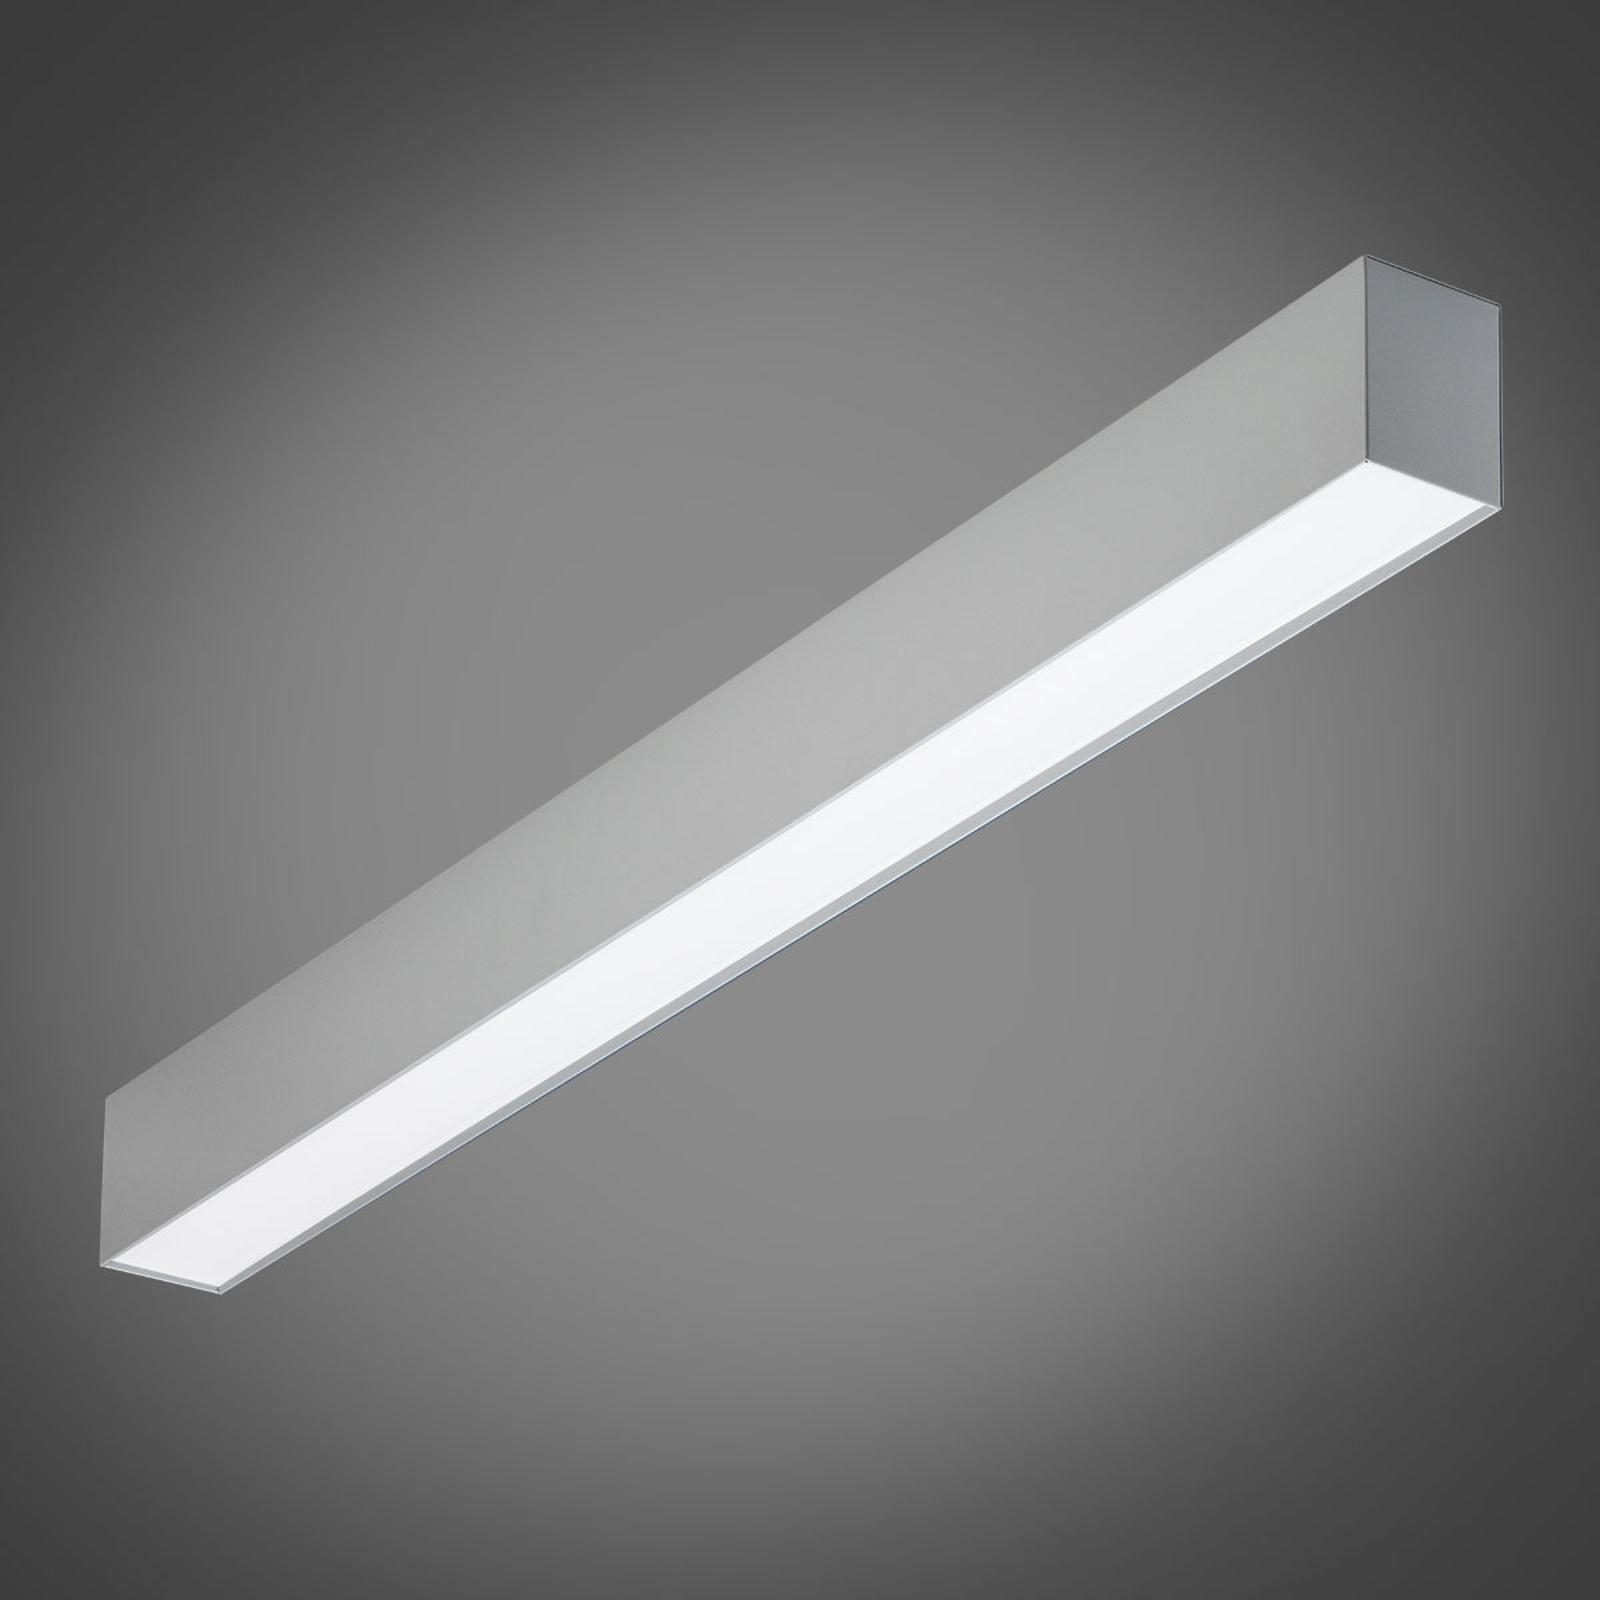 Energiatehokas LED-seinävalaisin LIPW075, 4 000K